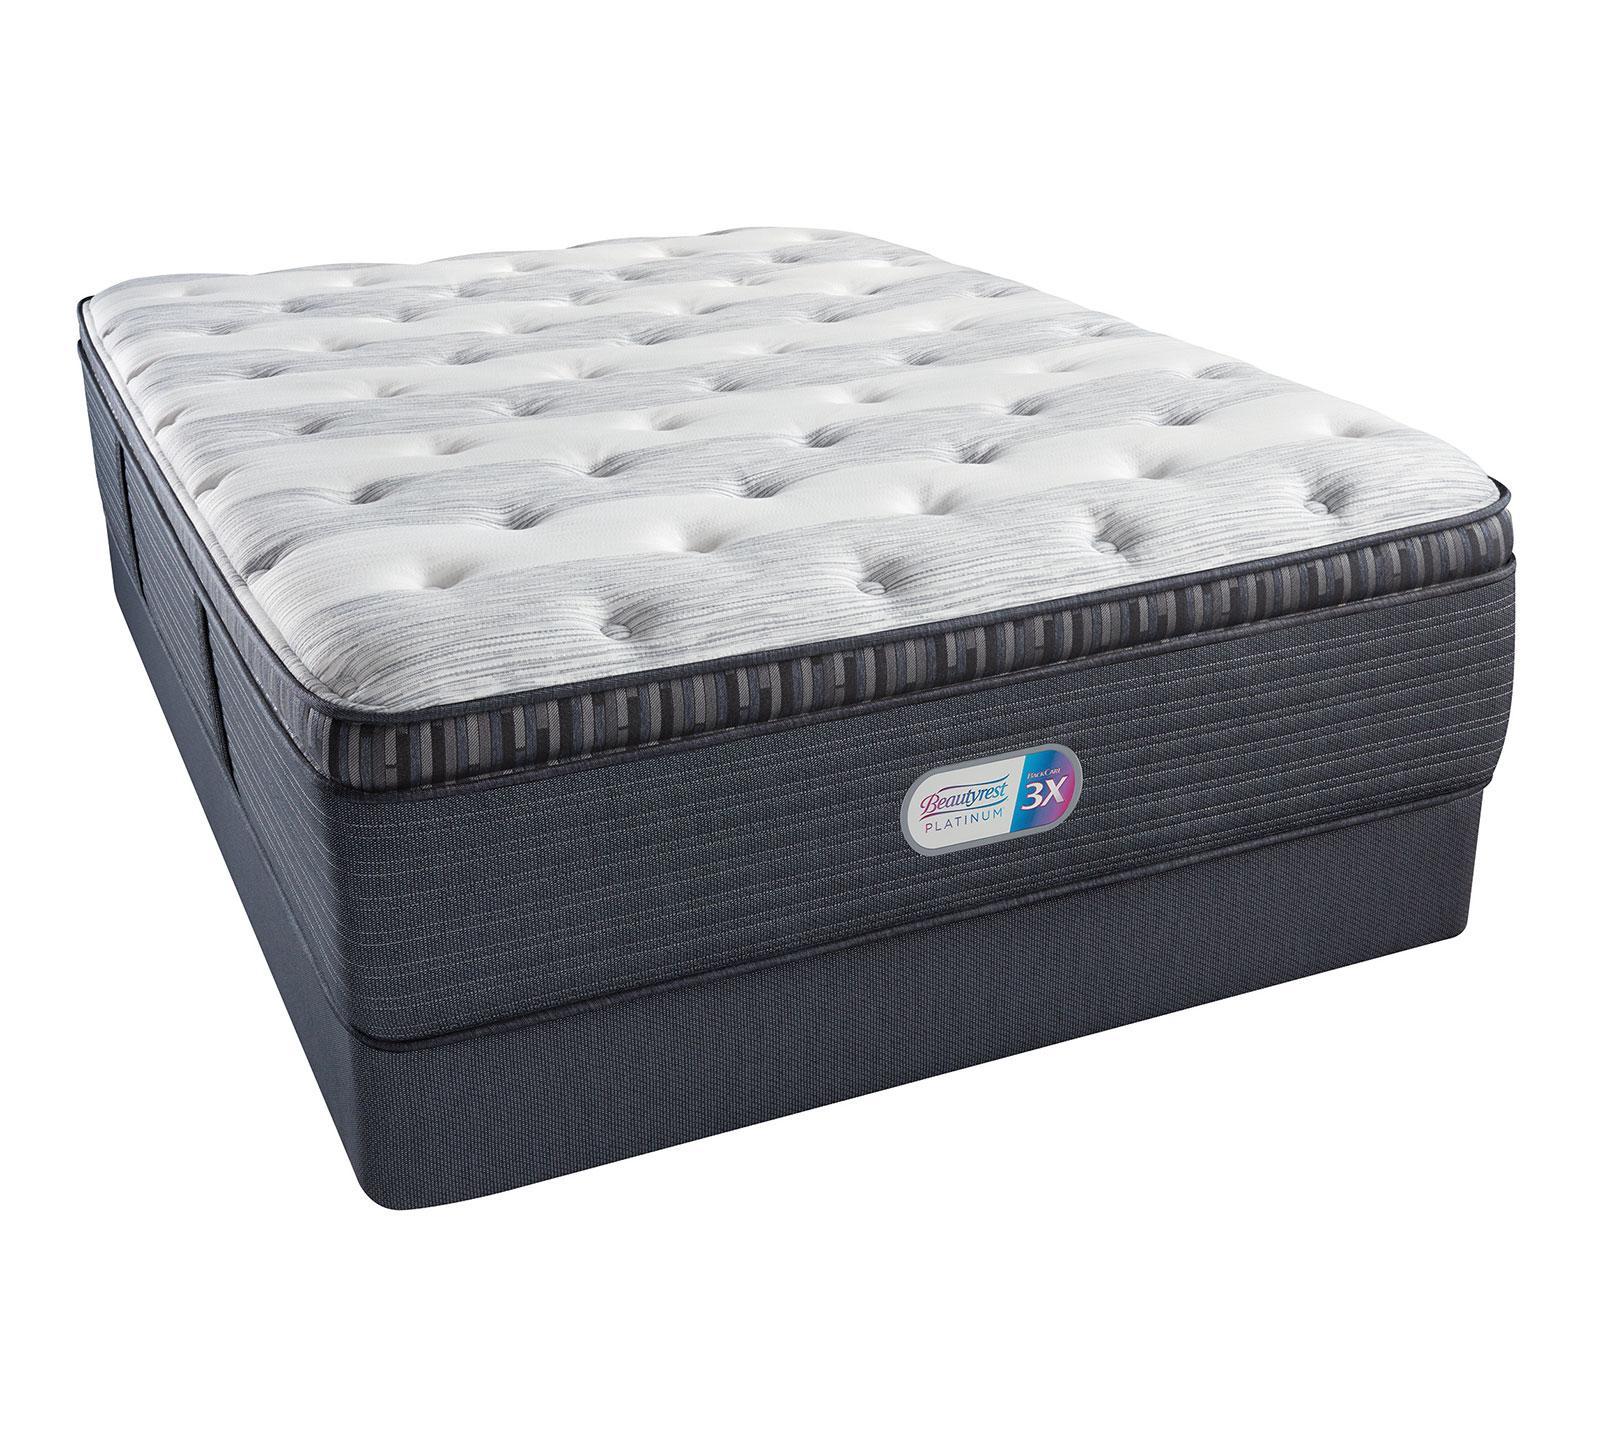 Simmons Beautyrest Platinum Garmon Pillowtop